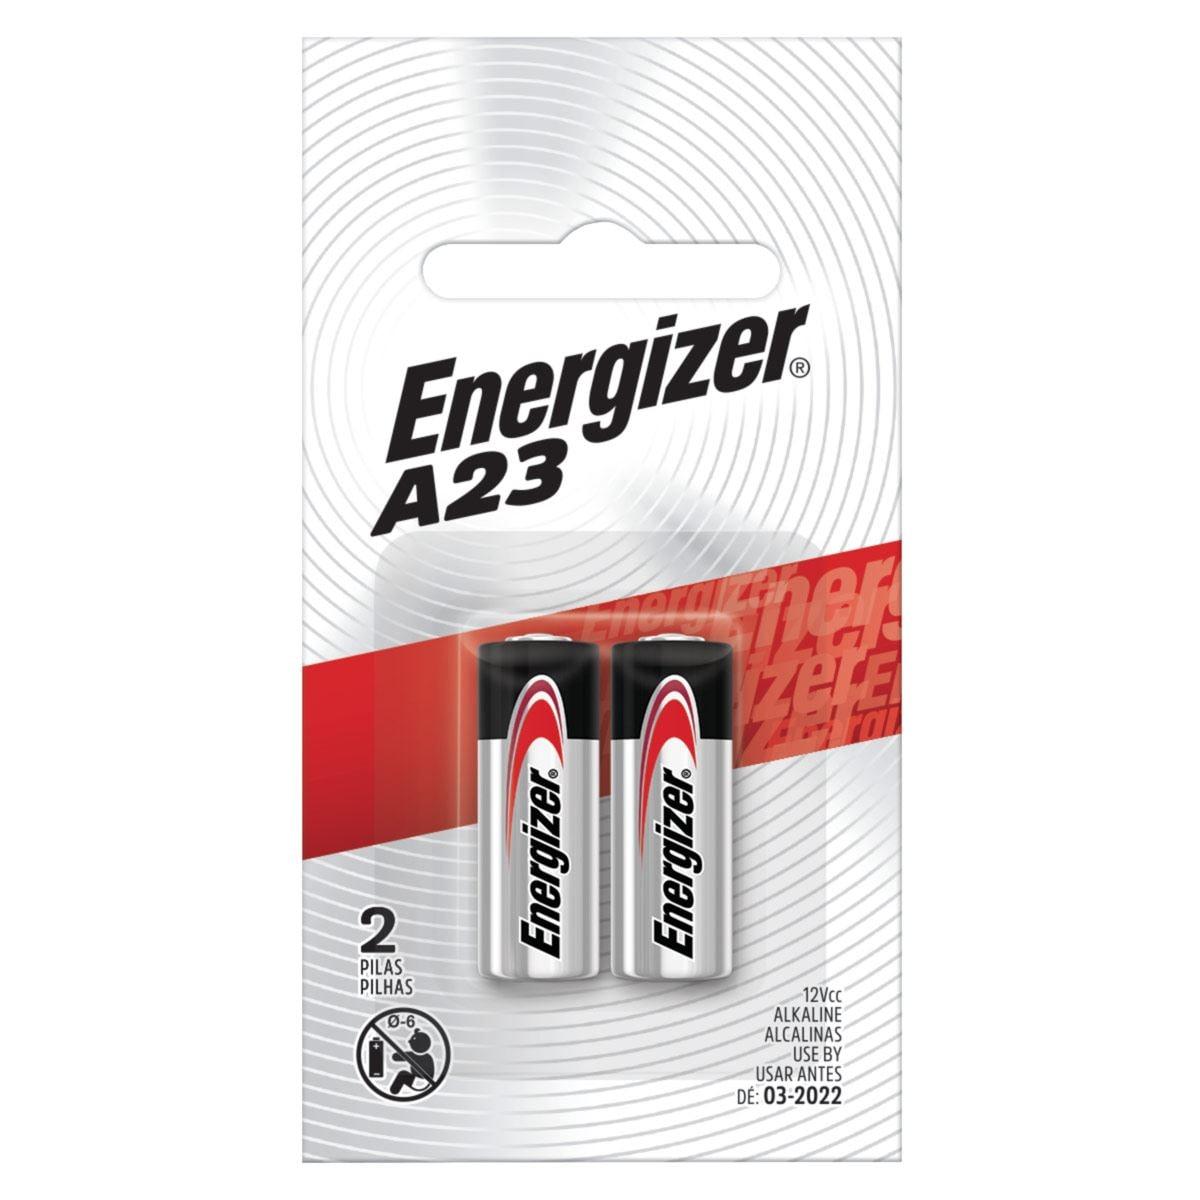 Pila Energizer A23 12v Bp2 Zm